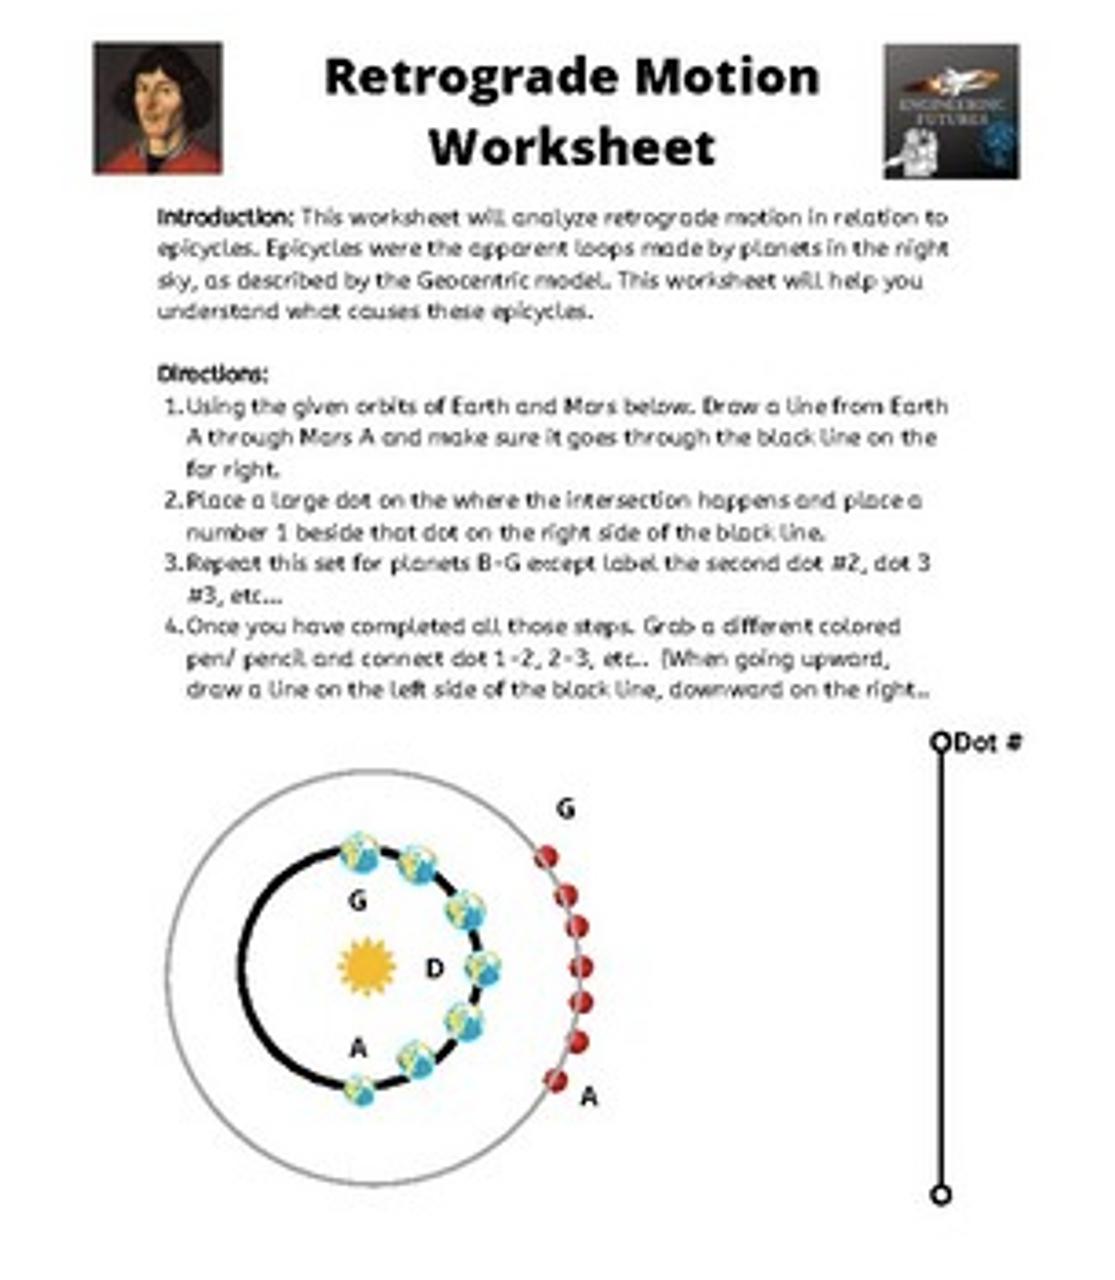 Retrograde Motion Worksheet